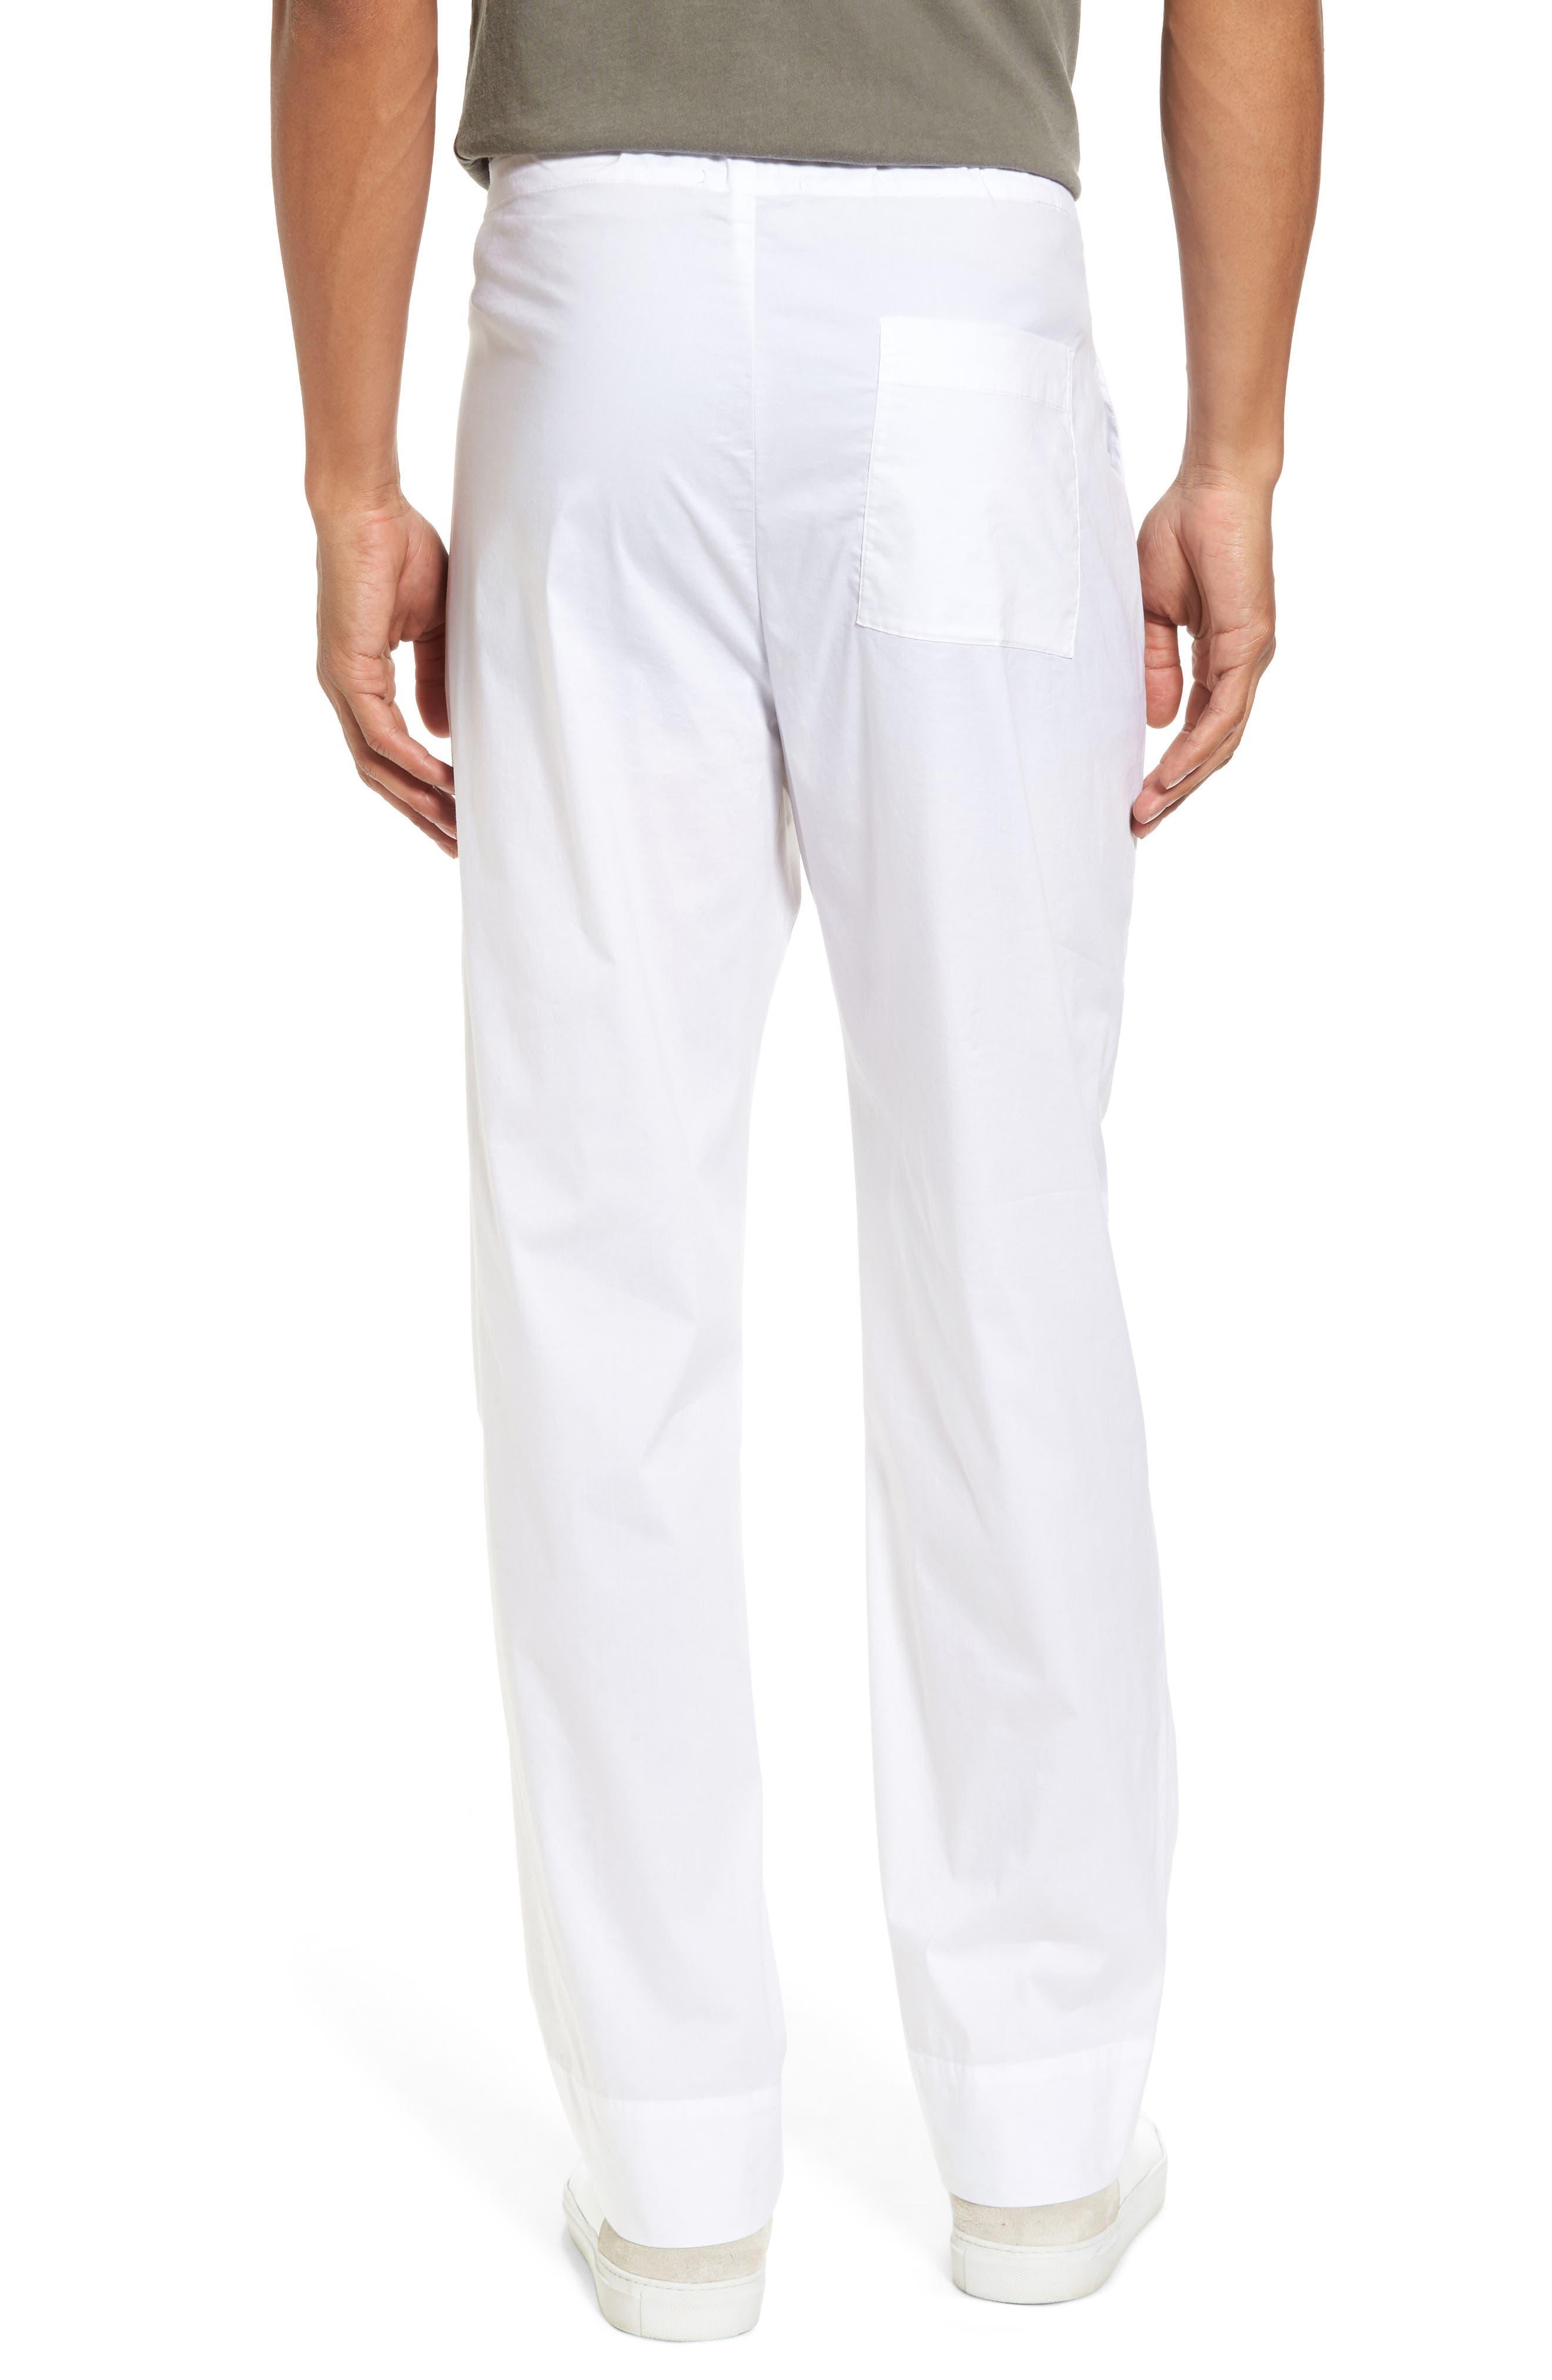 Drawstring Waist Pants,                             Alternate thumbnail 2, color,                             White